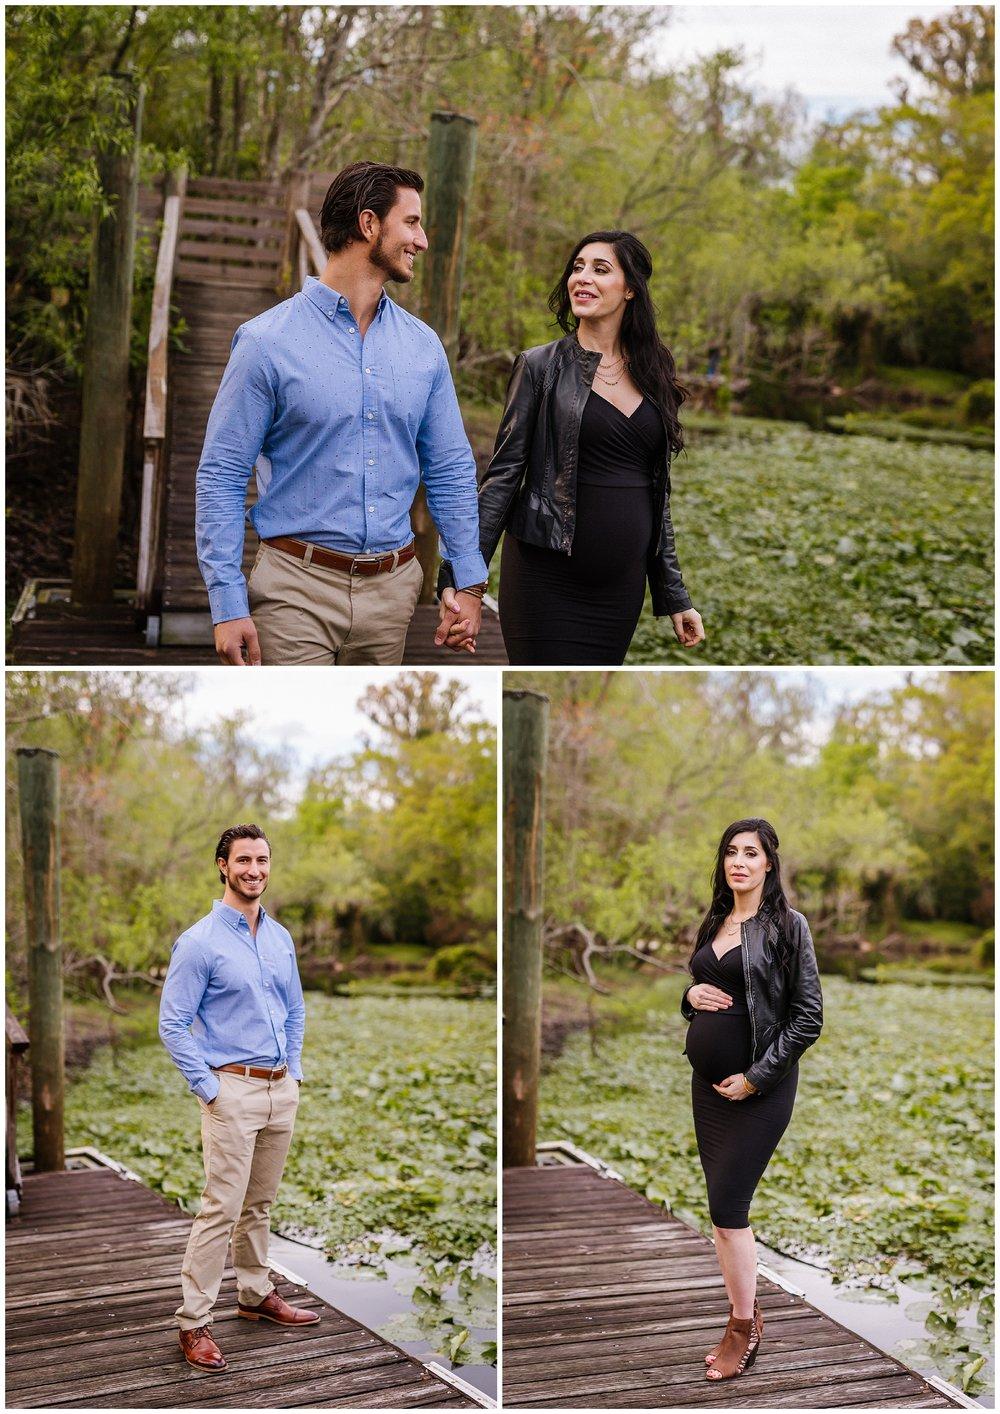 Tampa-maternity-photographer-morris-bridge-park-hip-tight-black-dress-woods_0006.jpg